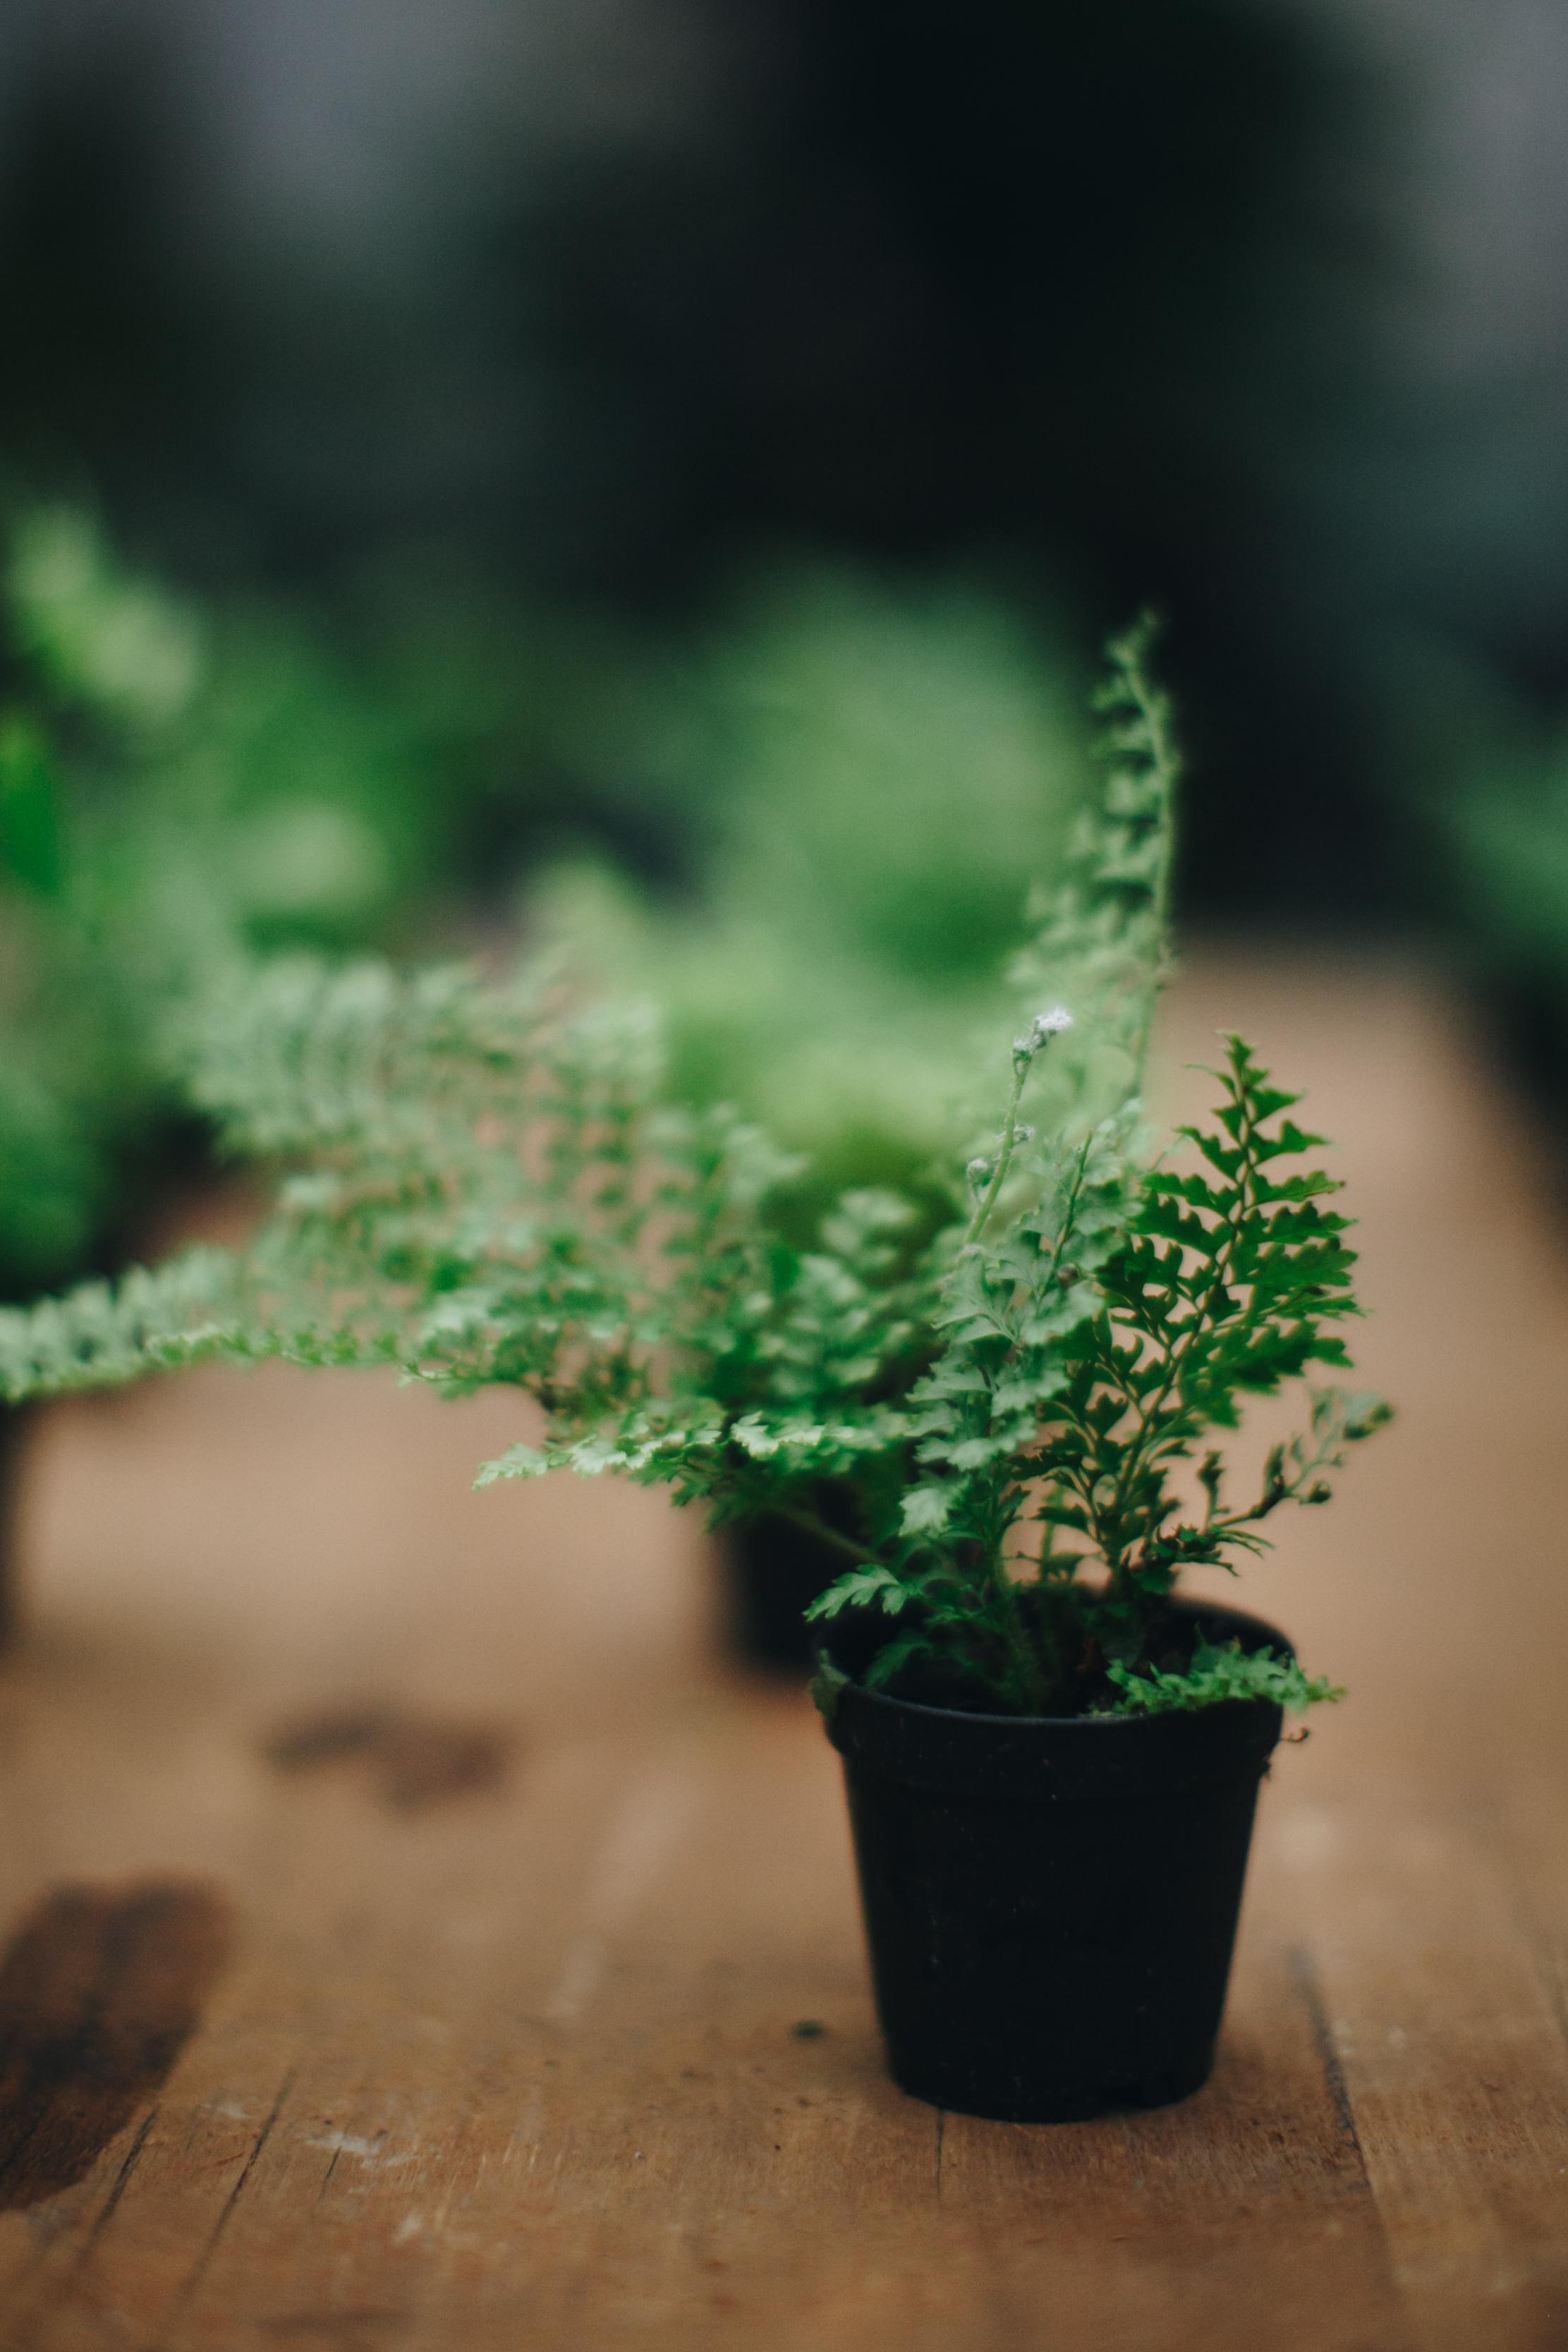 plantshed-9619.jpg